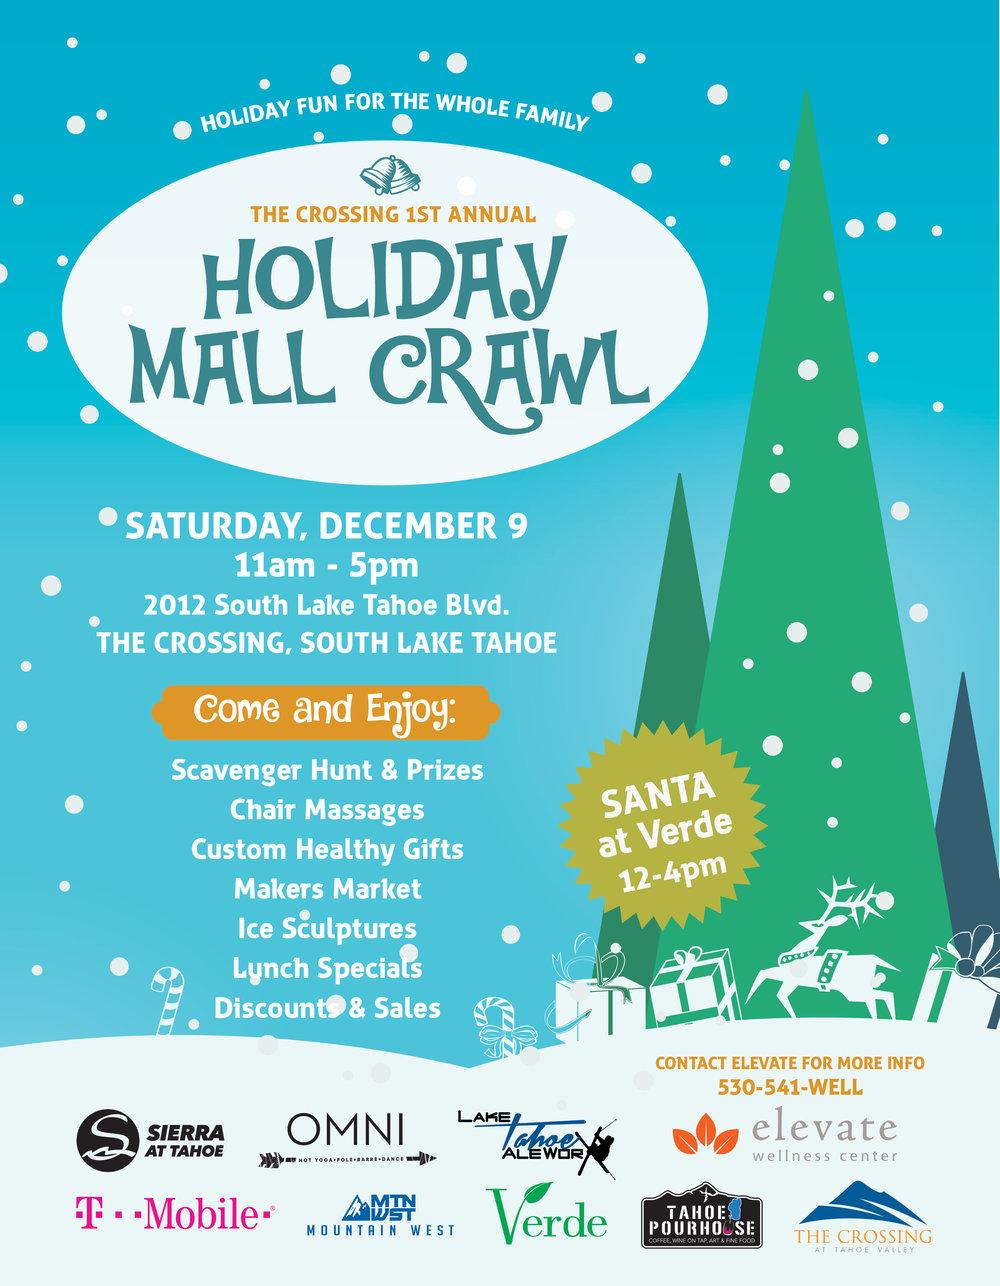 holiday_mall_crawl5.jpg